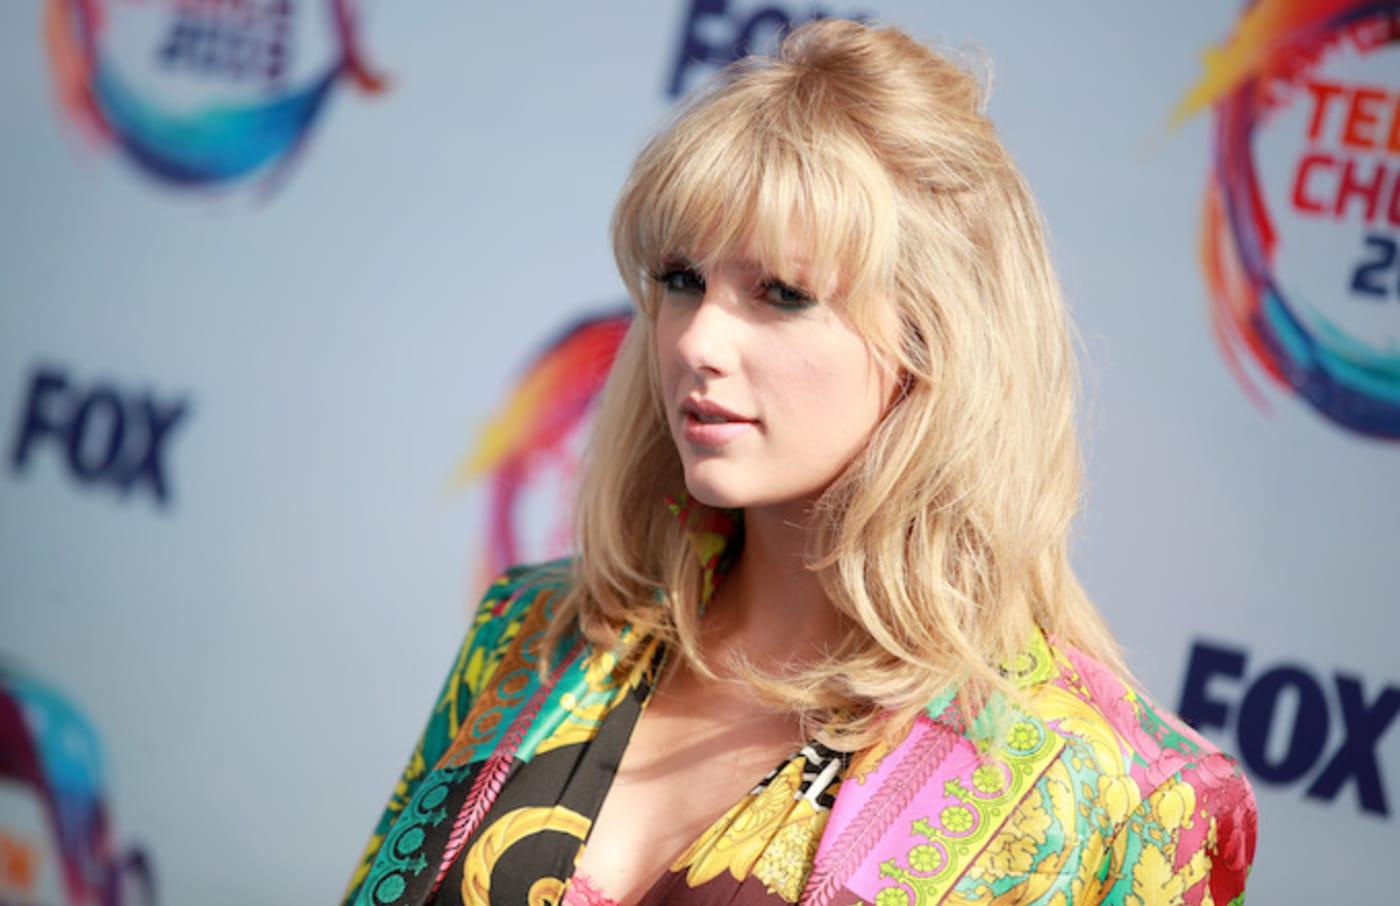 Taylor Swift attends FOX's Teen Choice Awards 2019.